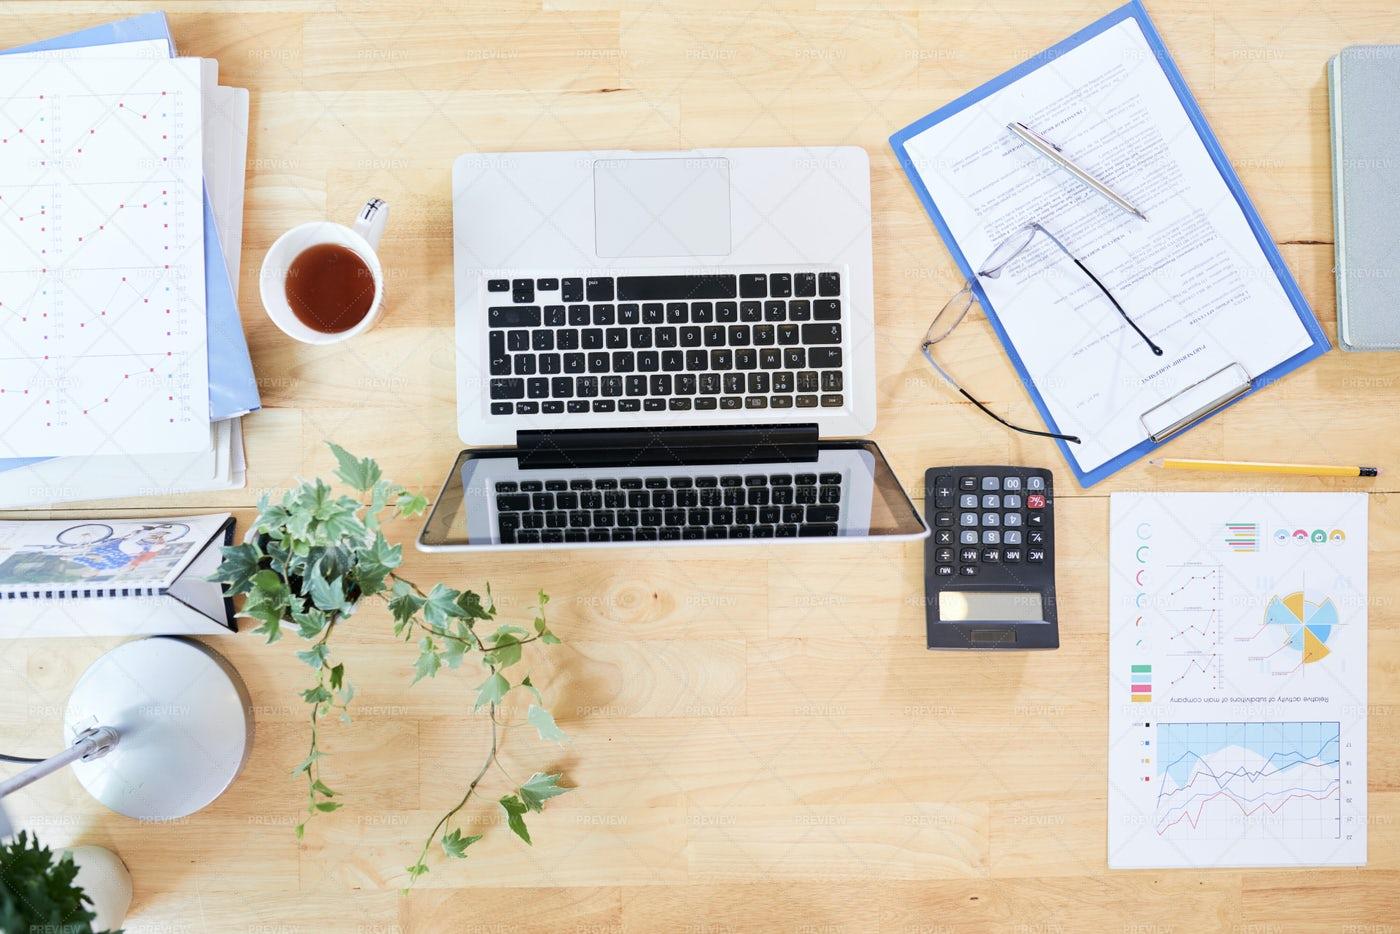 Workspace Of Entrepreneur: Stock Photos